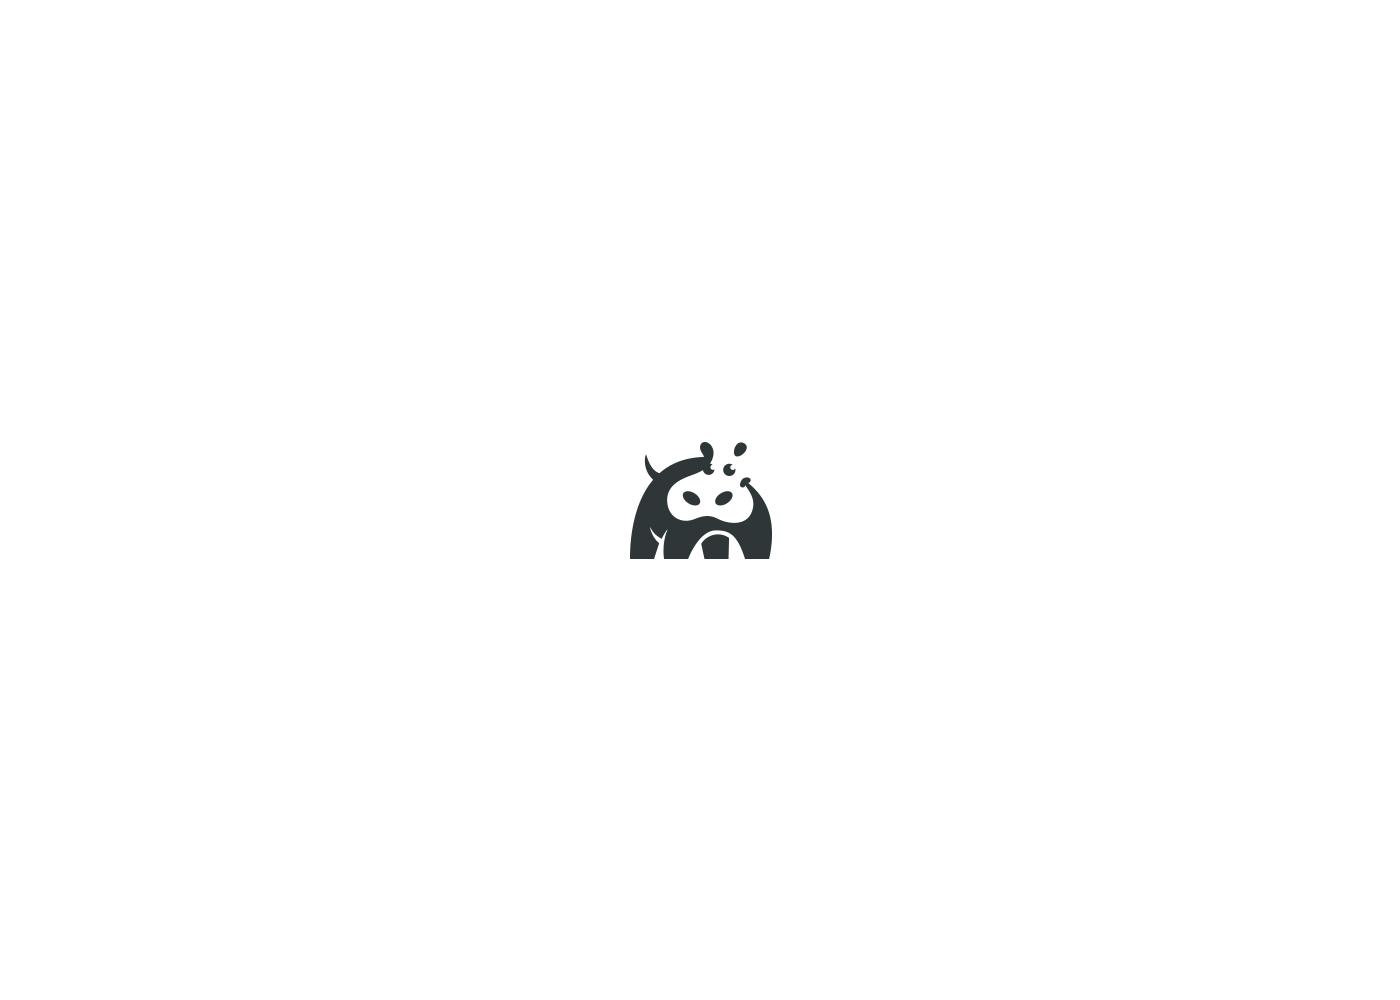 negative space Logo Design brand identity logo animals symbols animal hippo giraffe eagle bear zebra Kreatank creatank creative